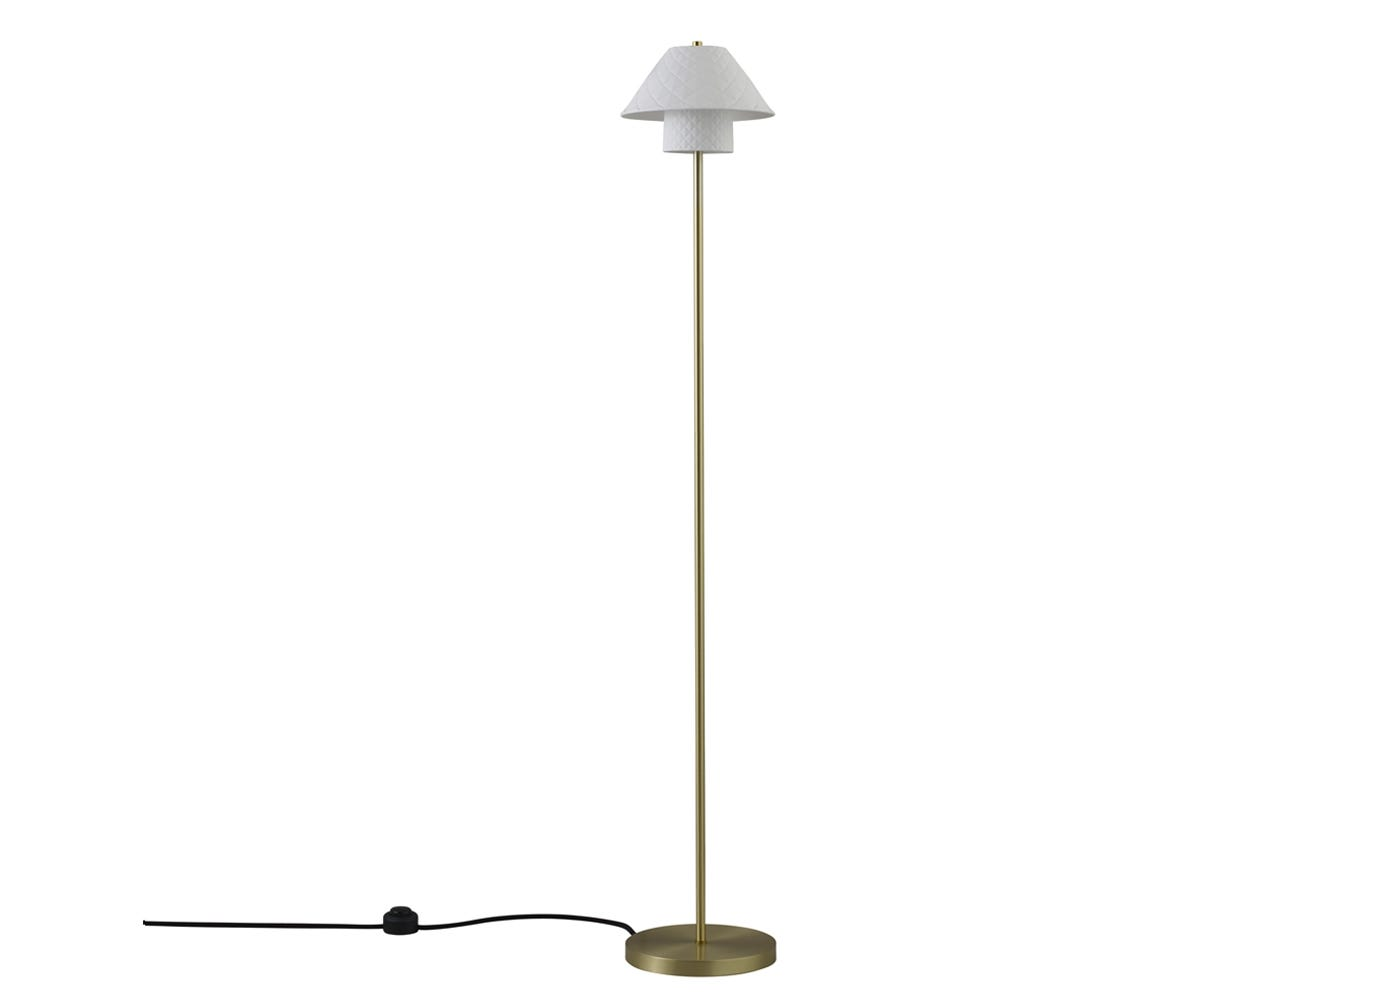 Oxford double floor lamp off